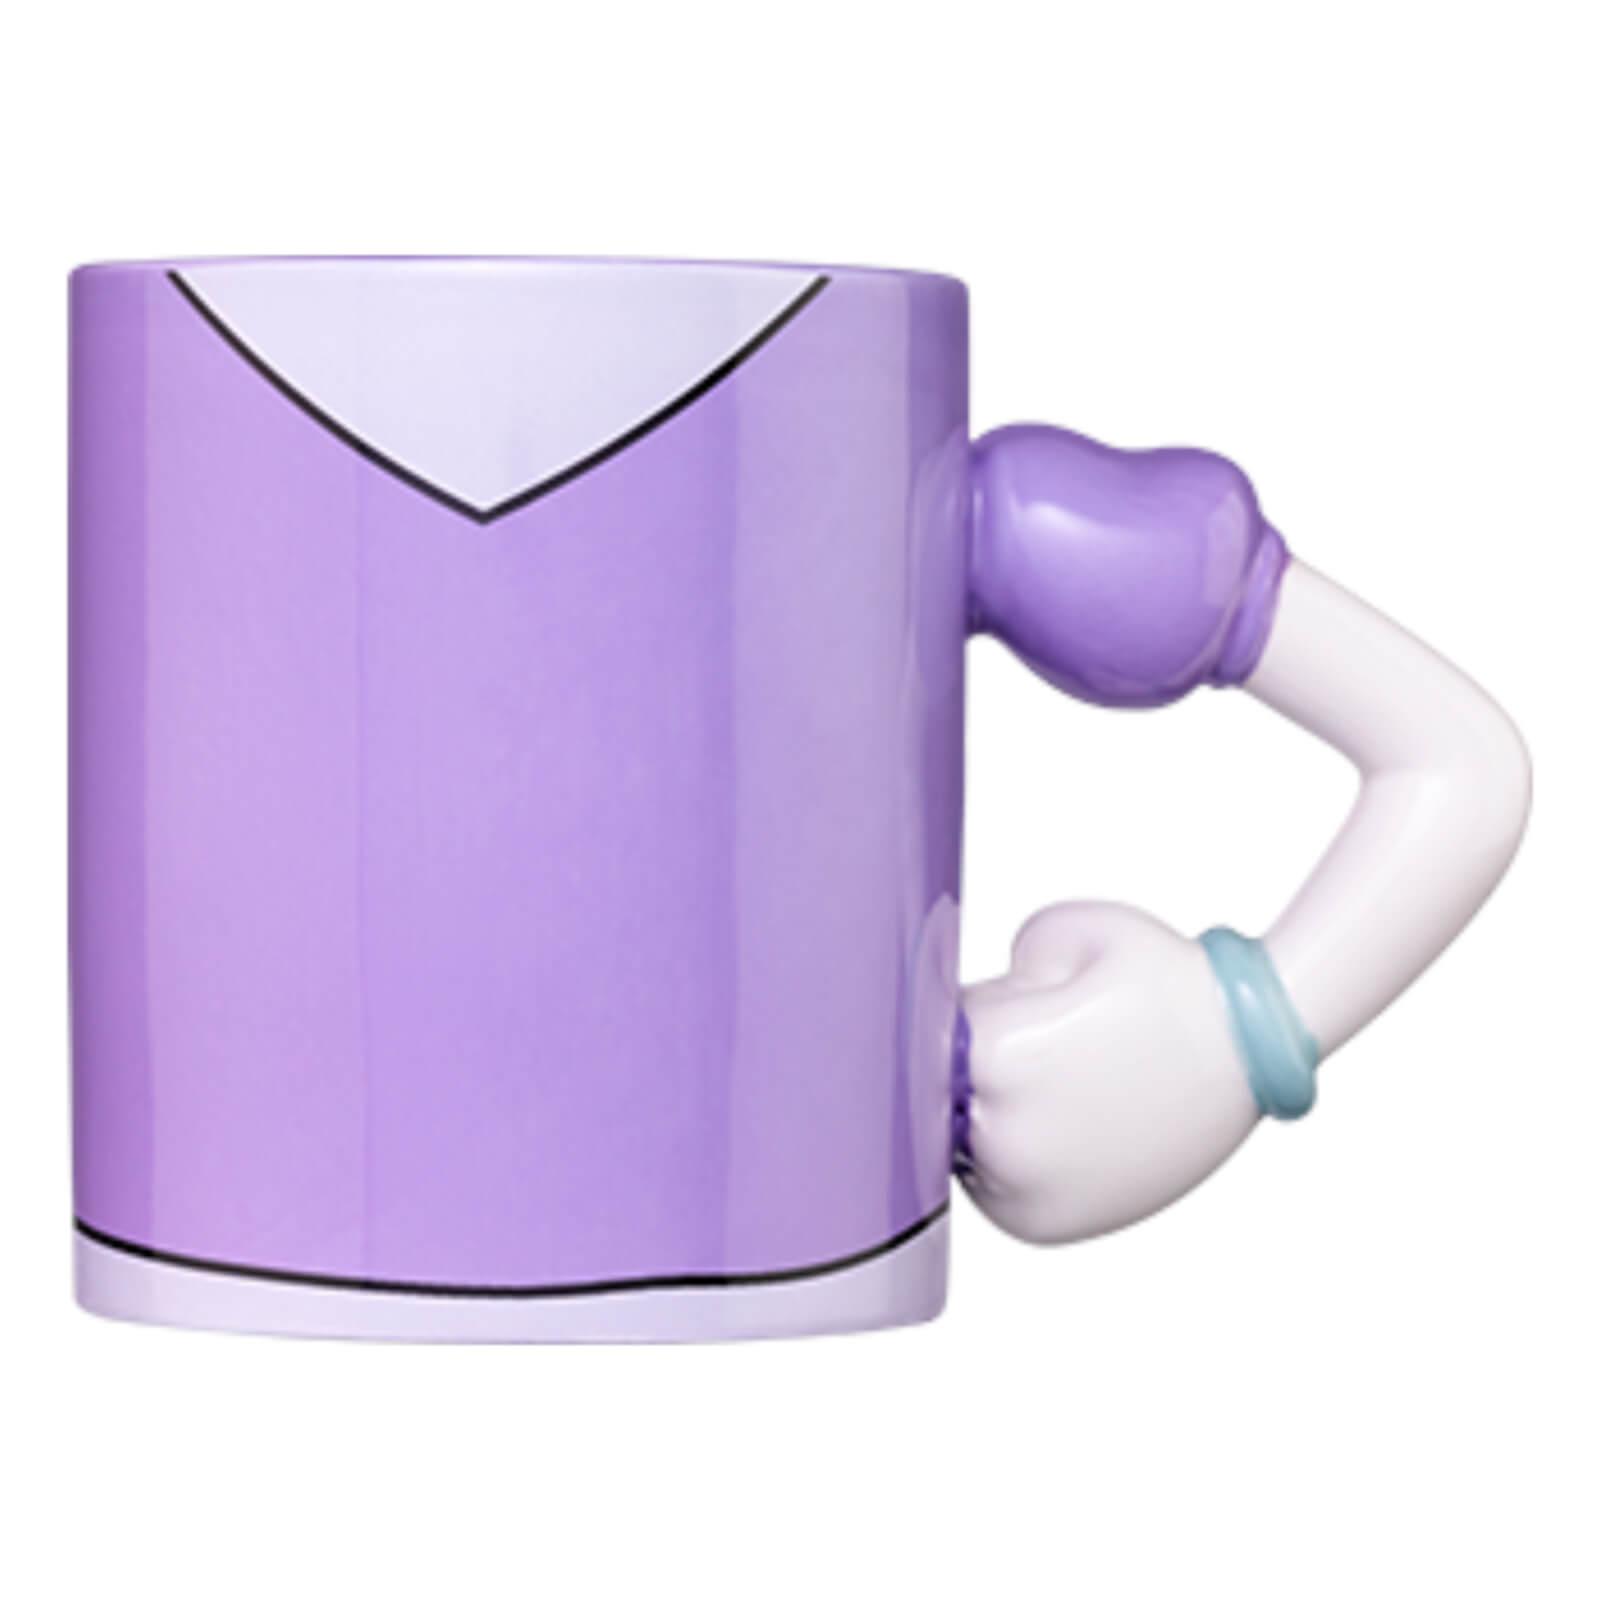 Image of Meta Merch Disney Daisy Duck Arm Mug